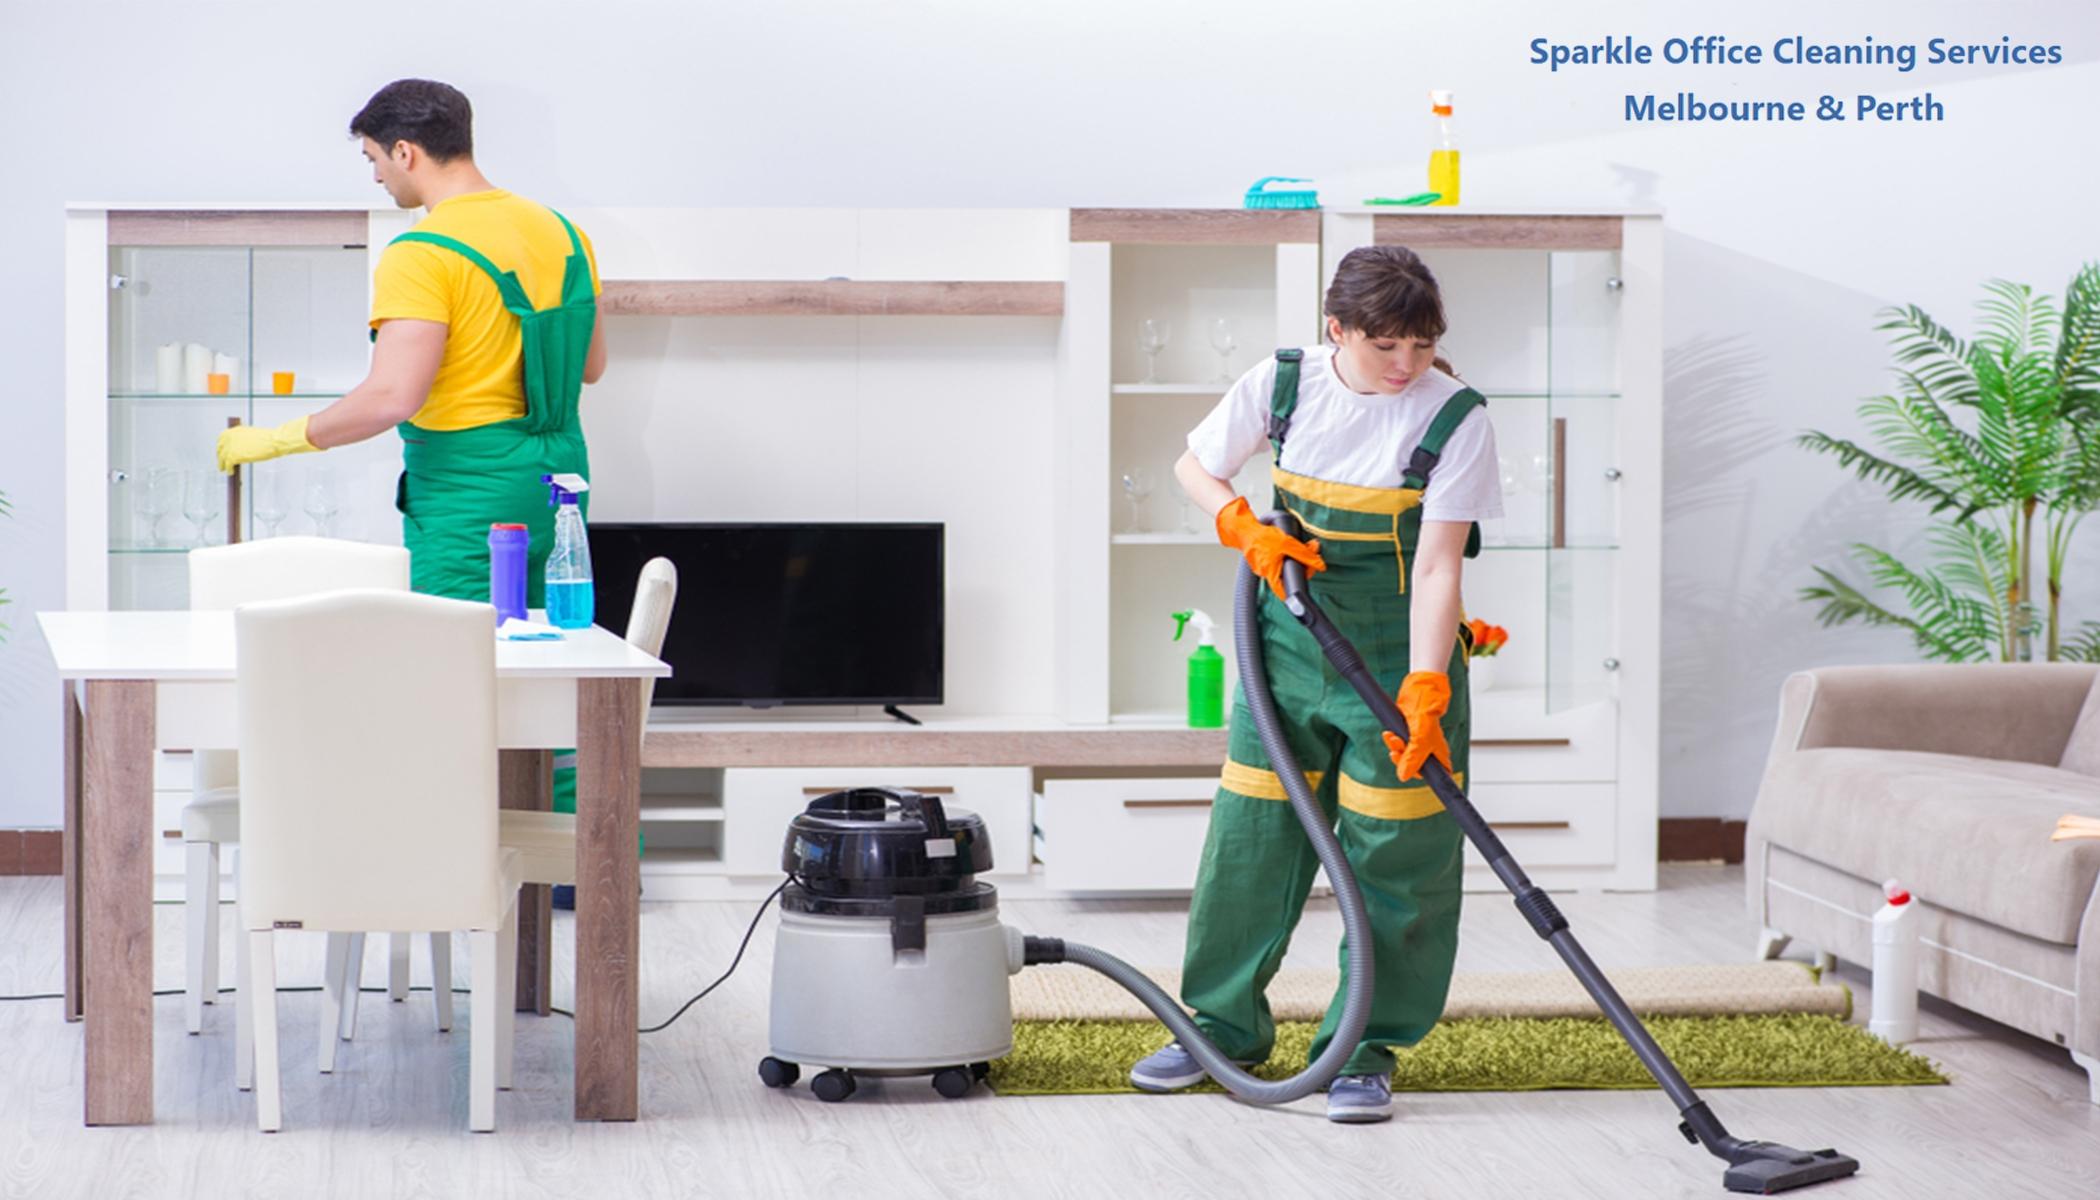 Sparkle Office Cleaning Services Melbourne (@sparkleofficeinmelbourne) Cover Image